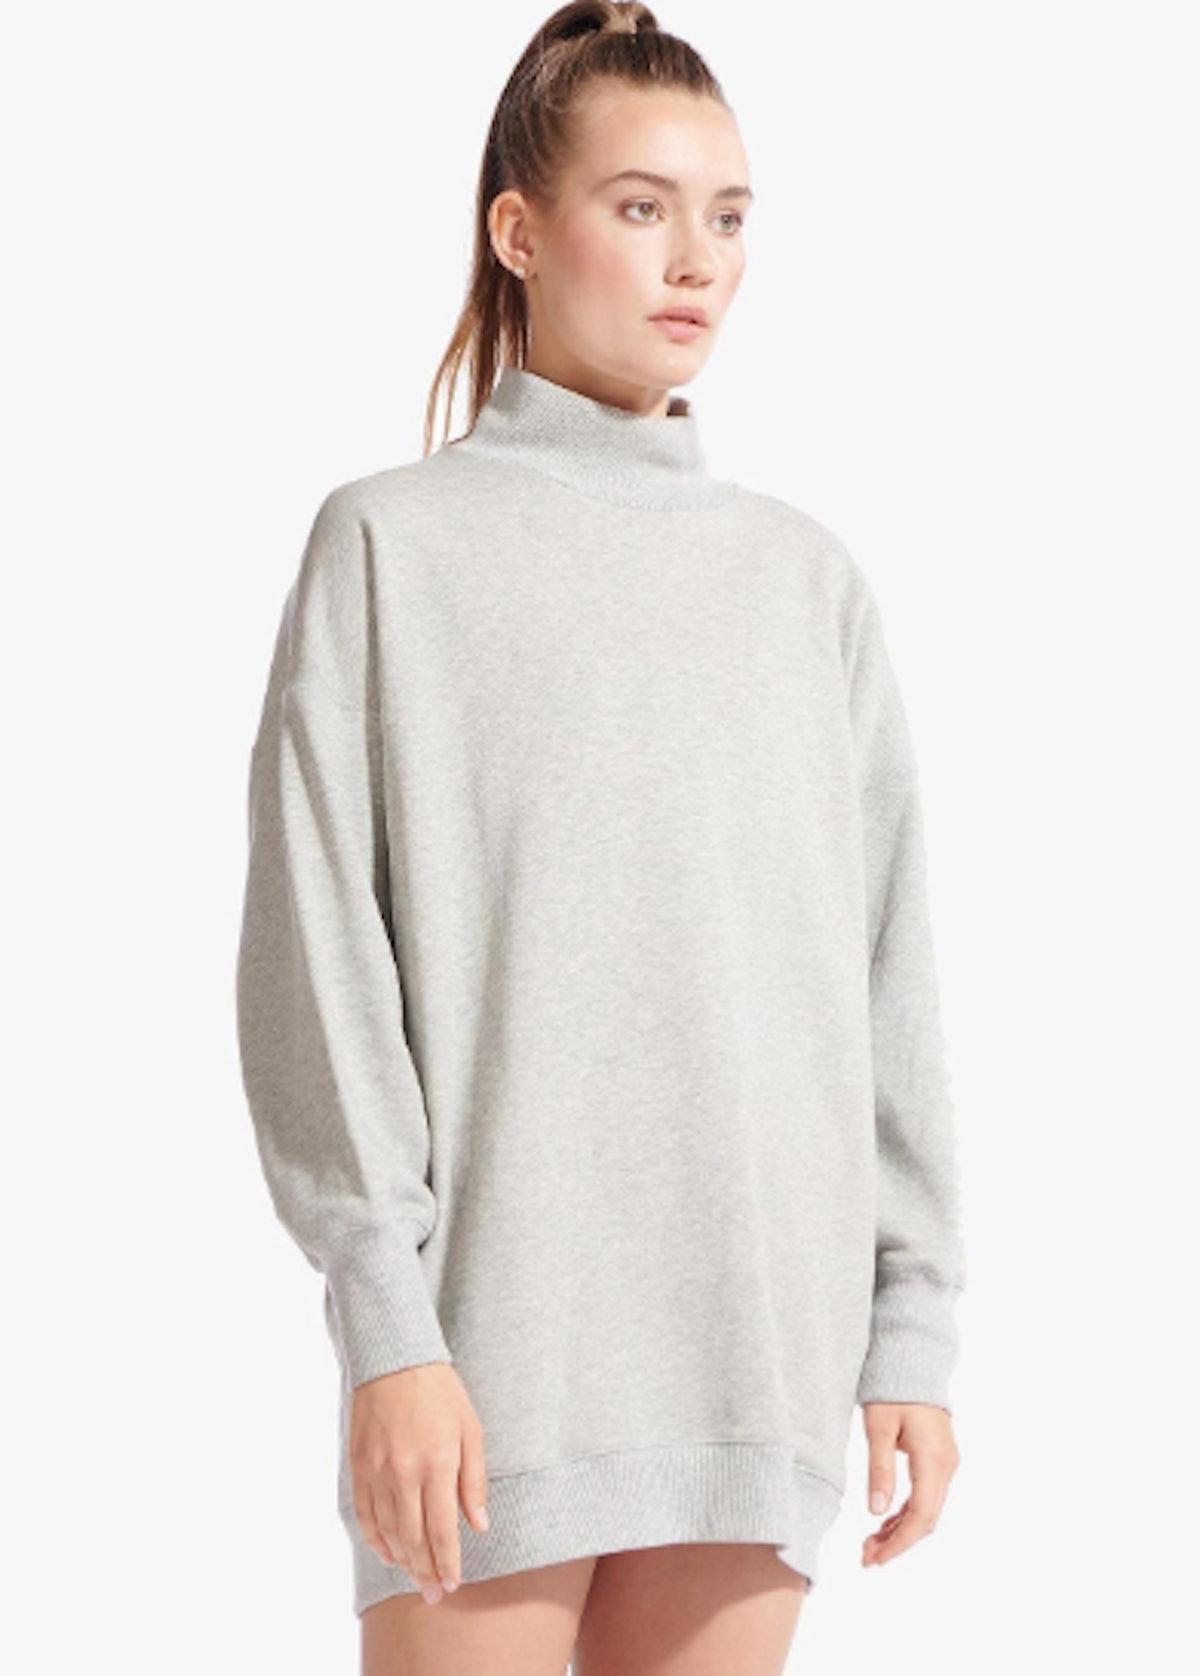 SWEATSHIRT DRESS | HEATHER GREY